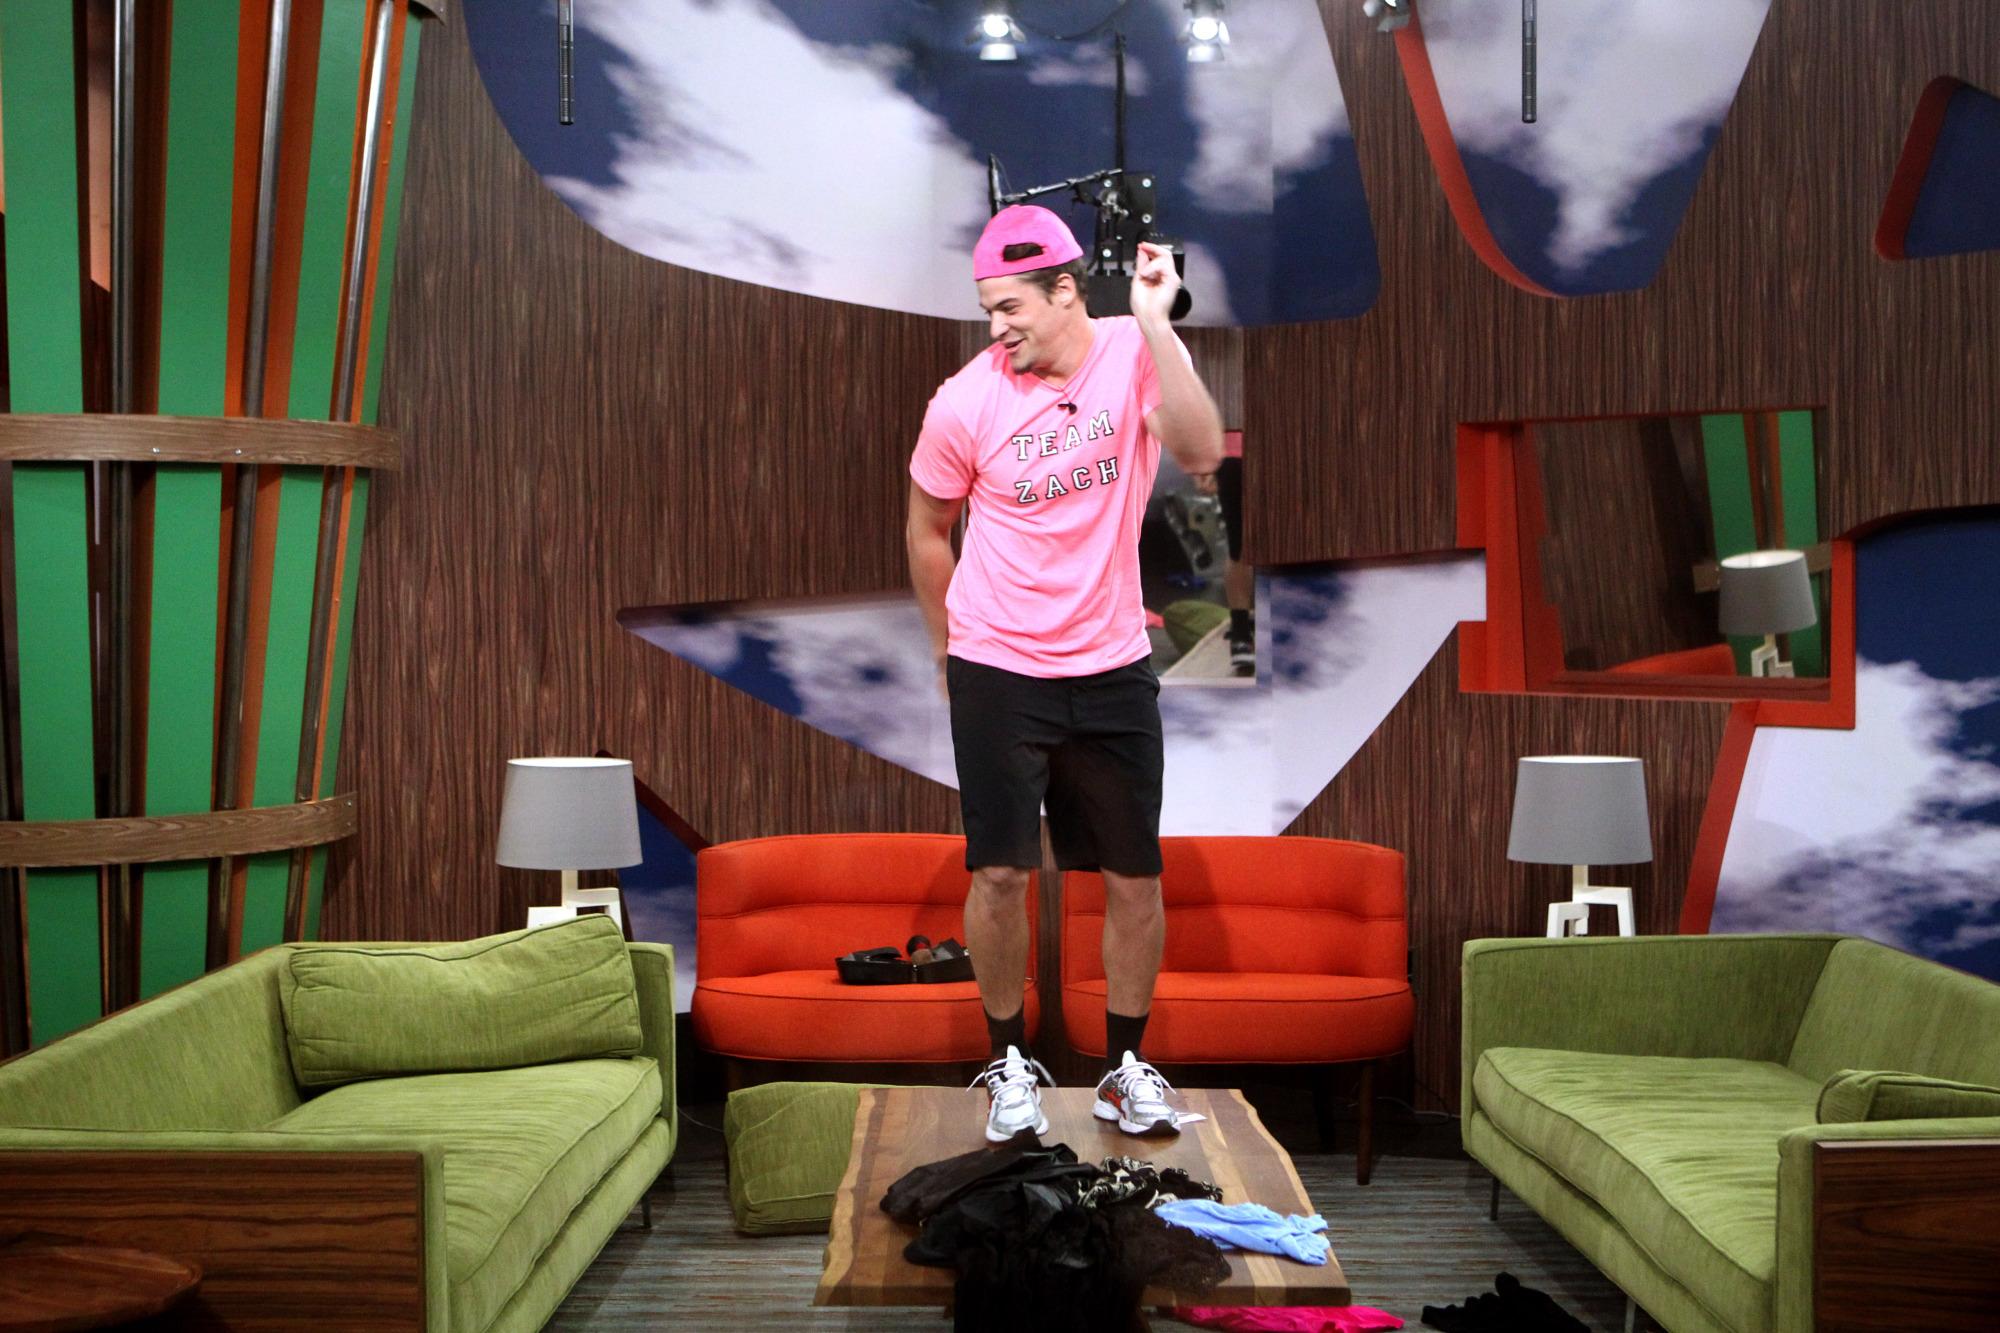 Zach dances on a table